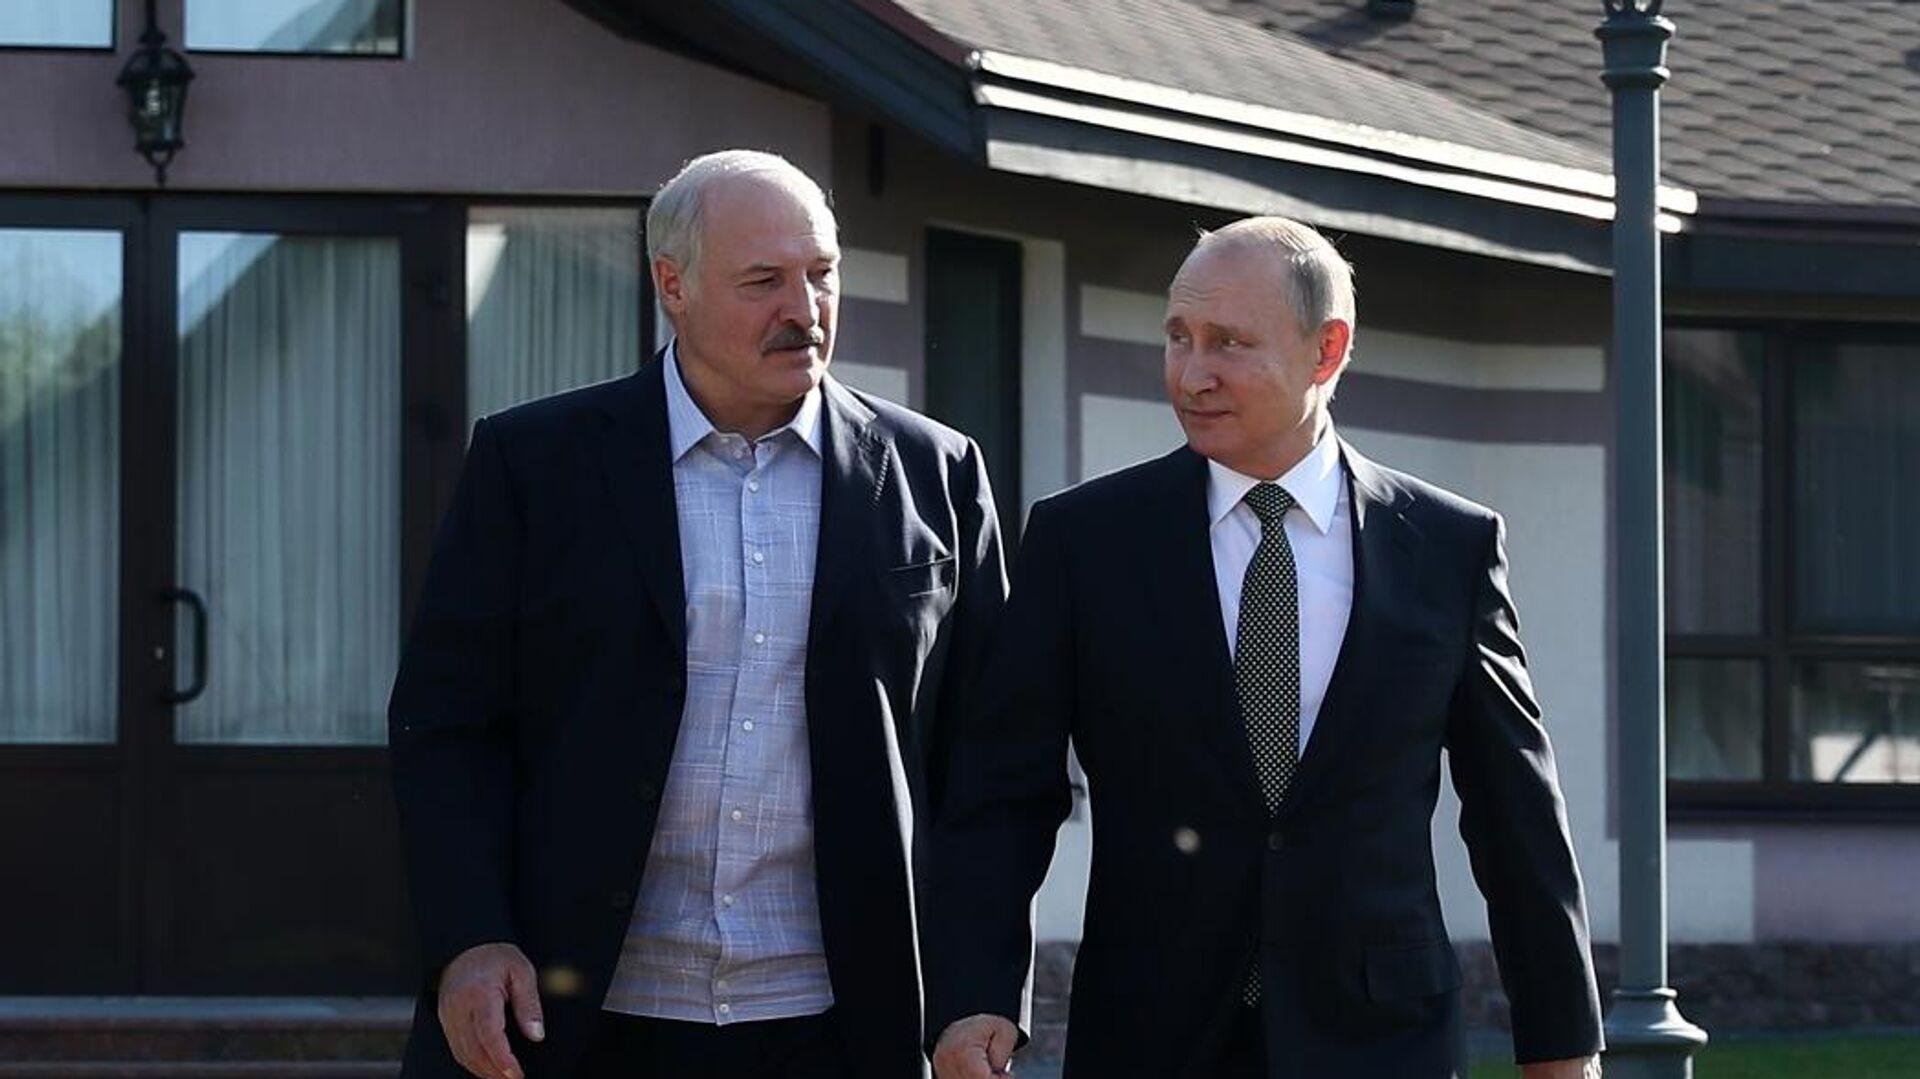 Президент РФ Владимир Путин и президент Белоруссии Александр Лукашенко - РИА Новости, 1920, 20.01.2021